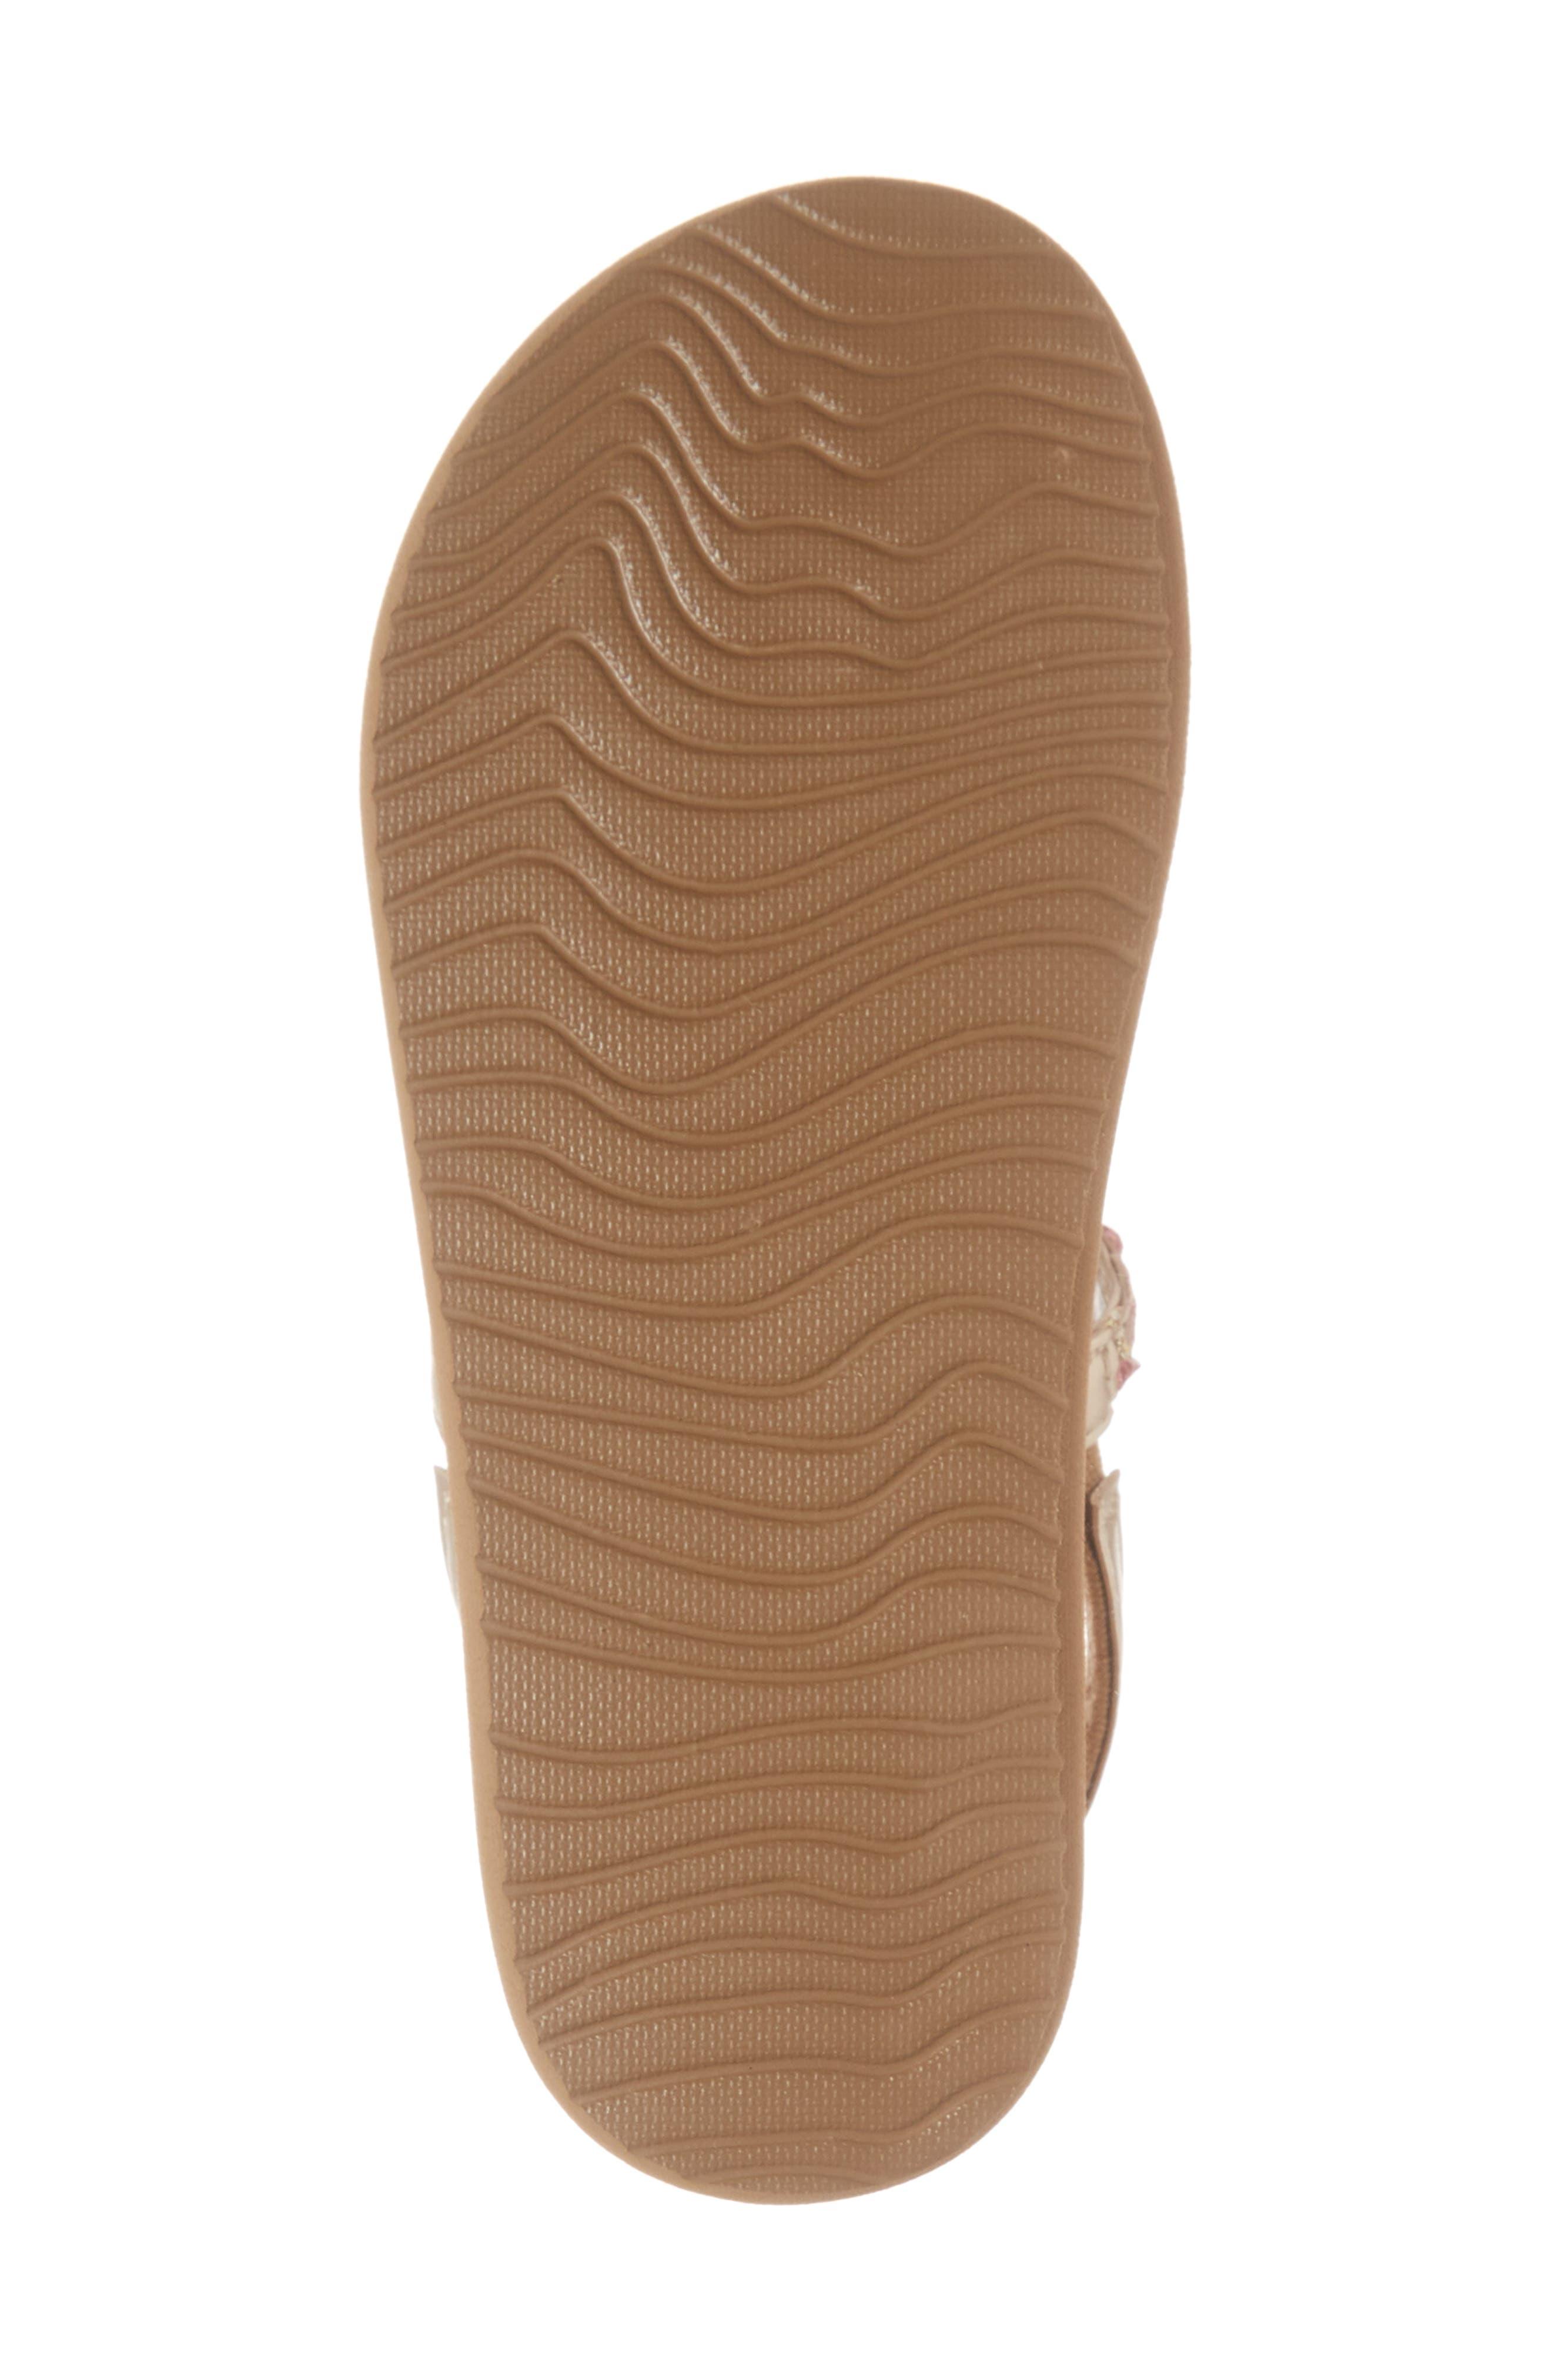 REEF, Little Twisted T-Strap Sandal, Alternate thumbnail 6, color, TAN